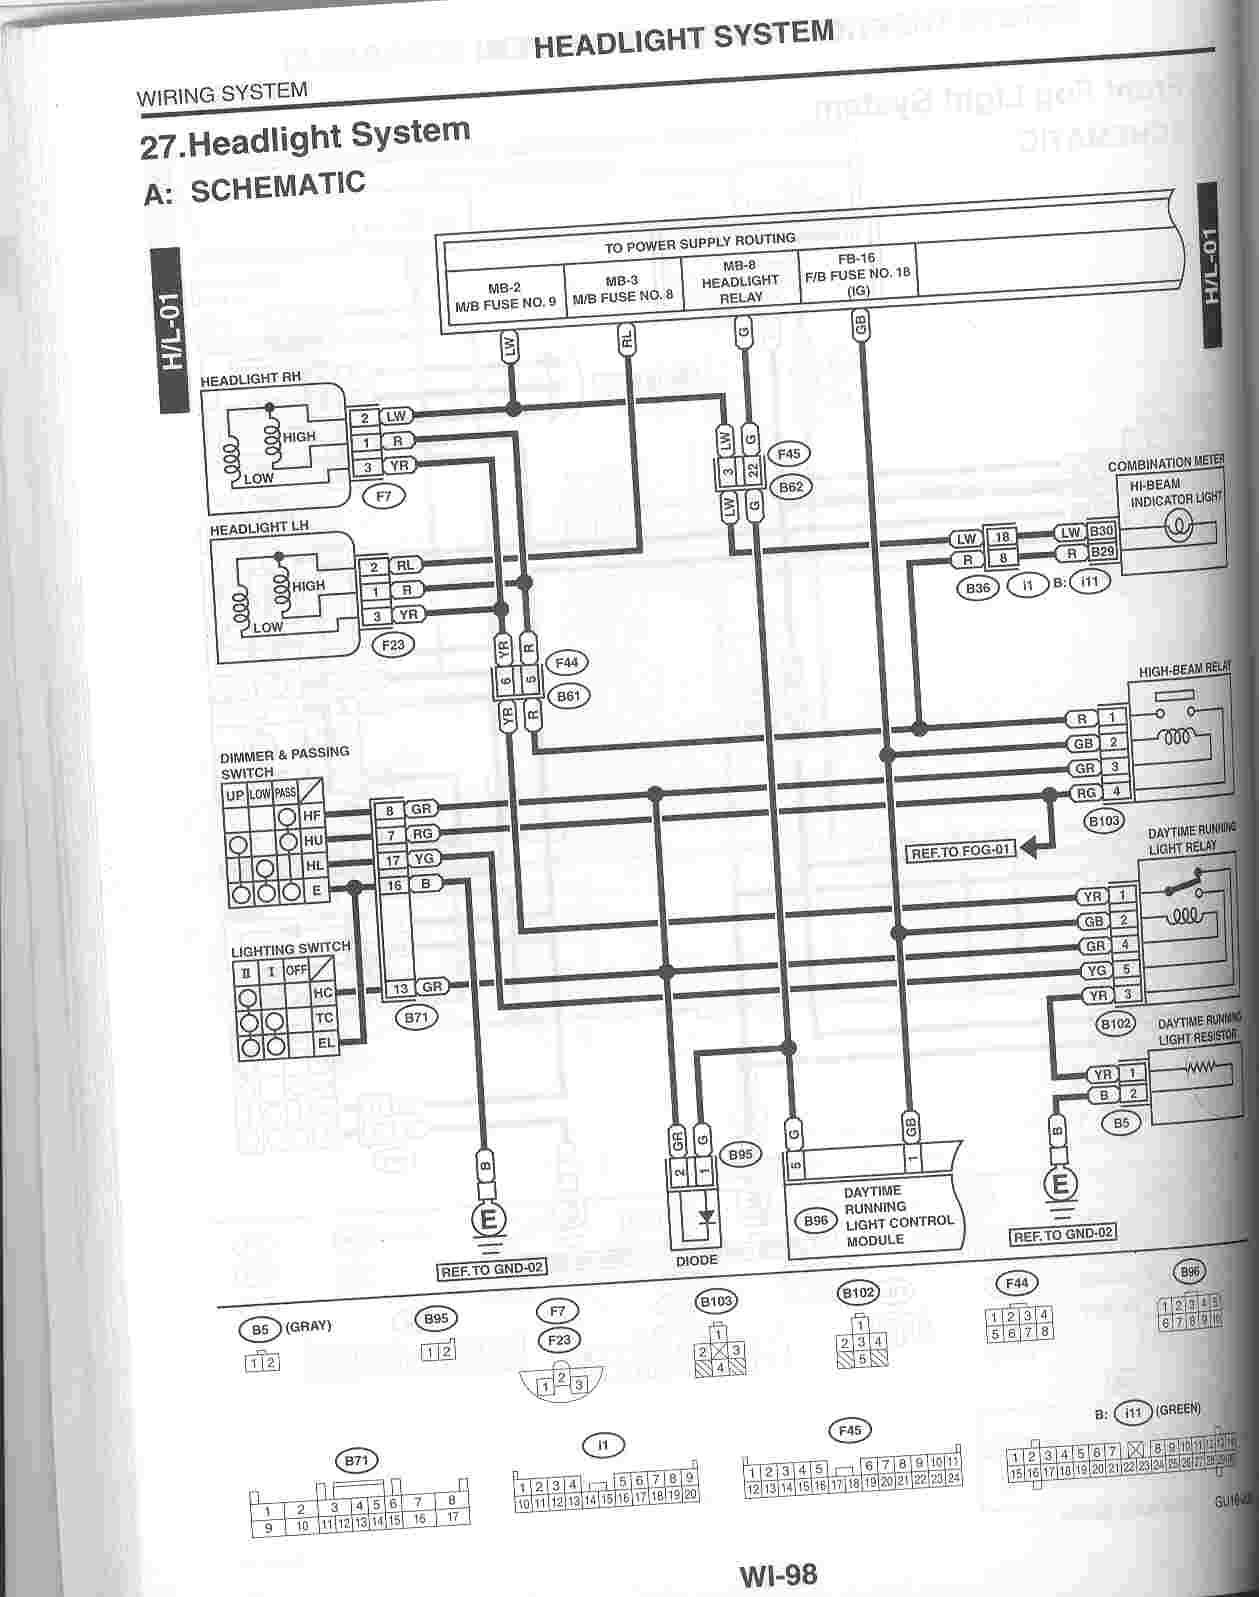 Subaru Headlight Harness Bauer Compressor Wiring Diagram Begeboy Wiring Diagram Source